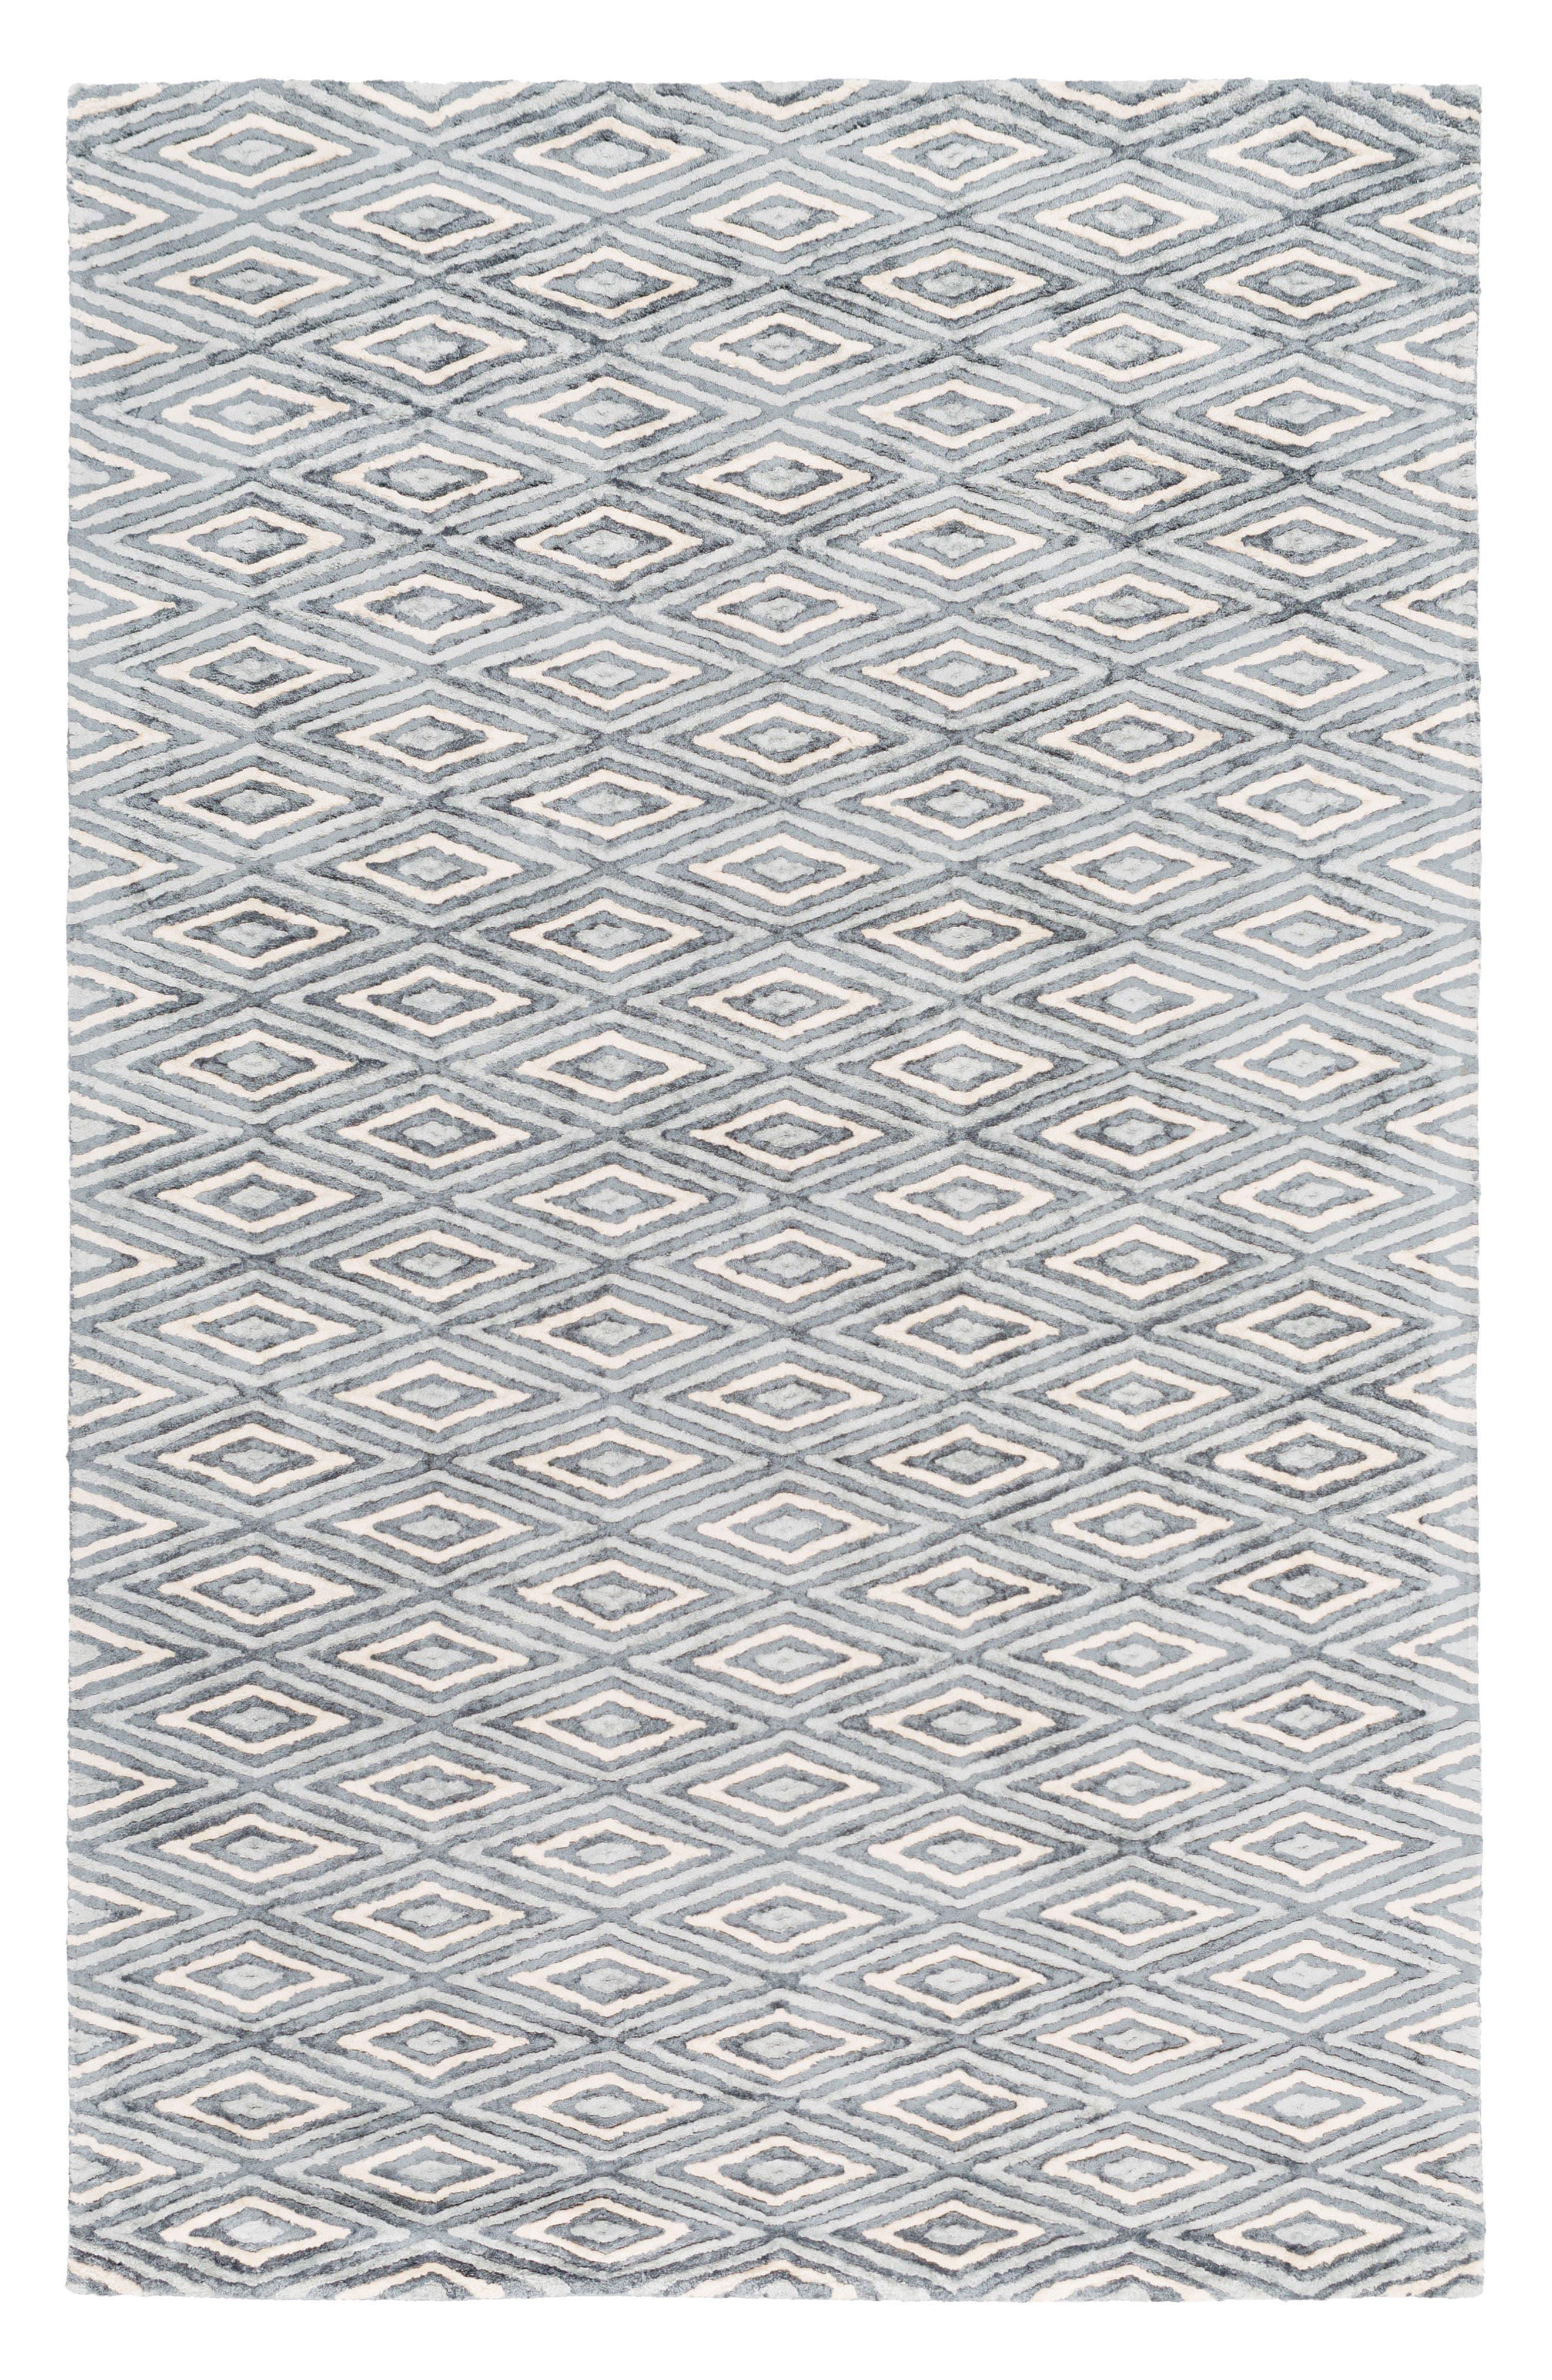 Zira Rug,                         Main,                         color, Grey